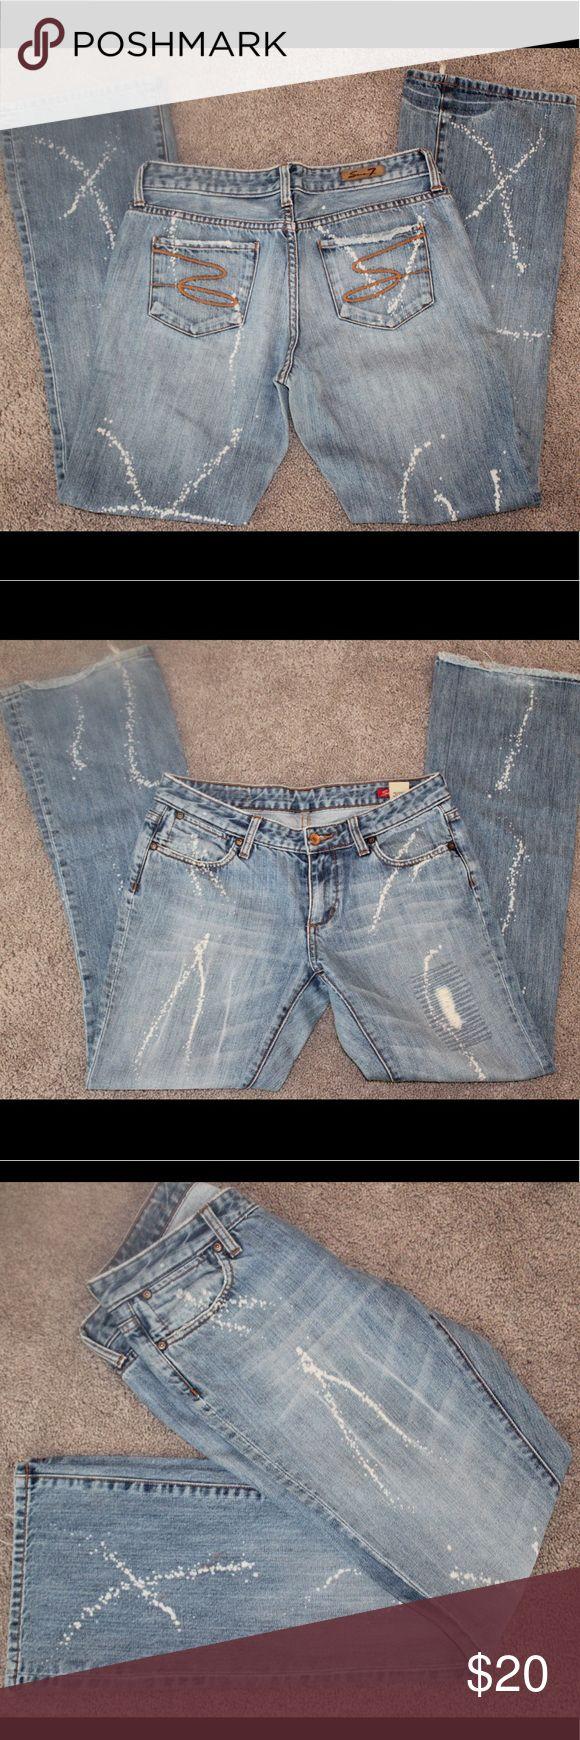 Seven jeans Bleach splatterd seven jeans with flare/boot leg Seven7 Jeans Boot Cut